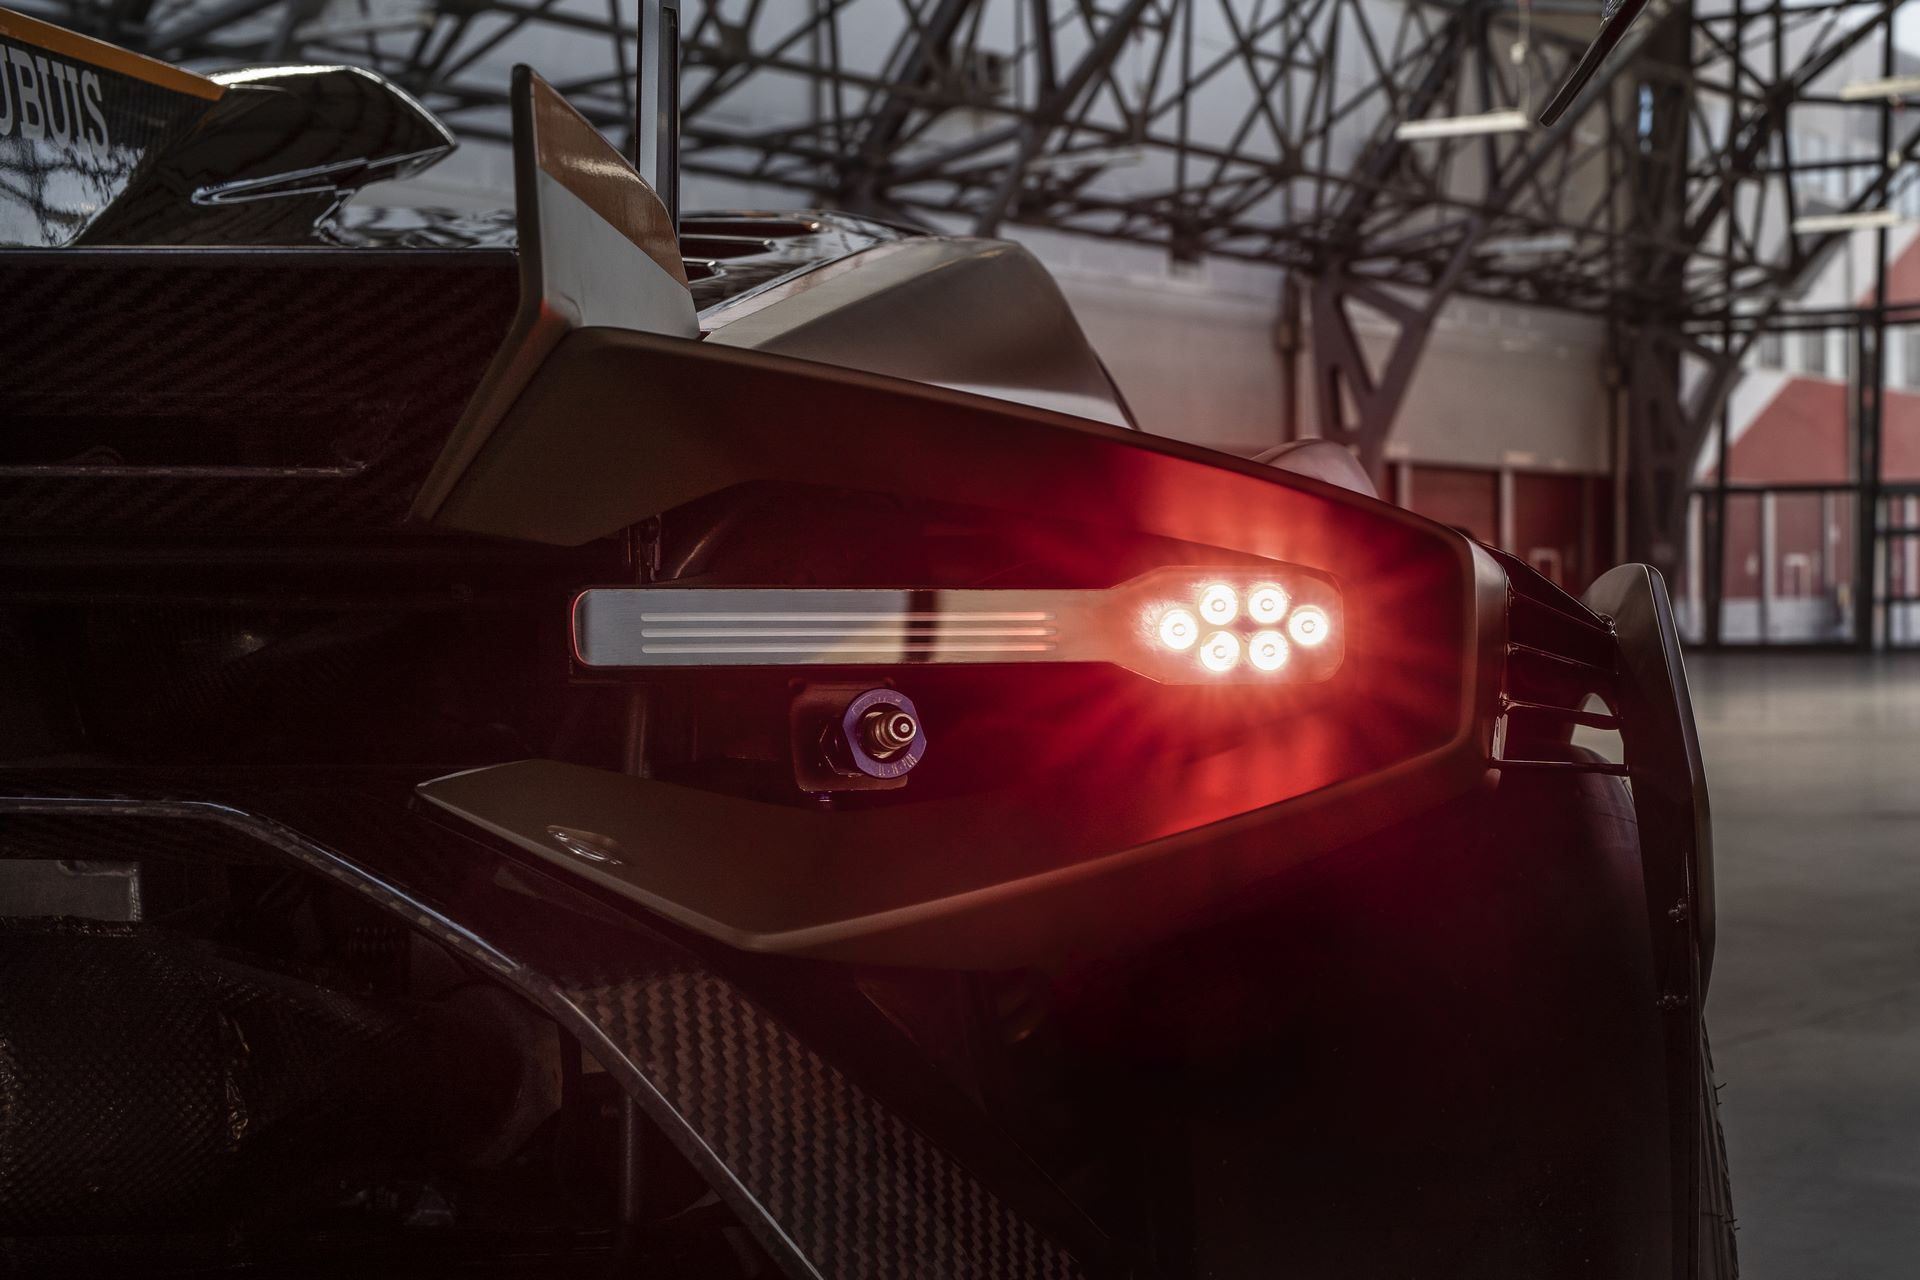 Lamborghini-Huracan-Super-Trofeo-EVO2-11